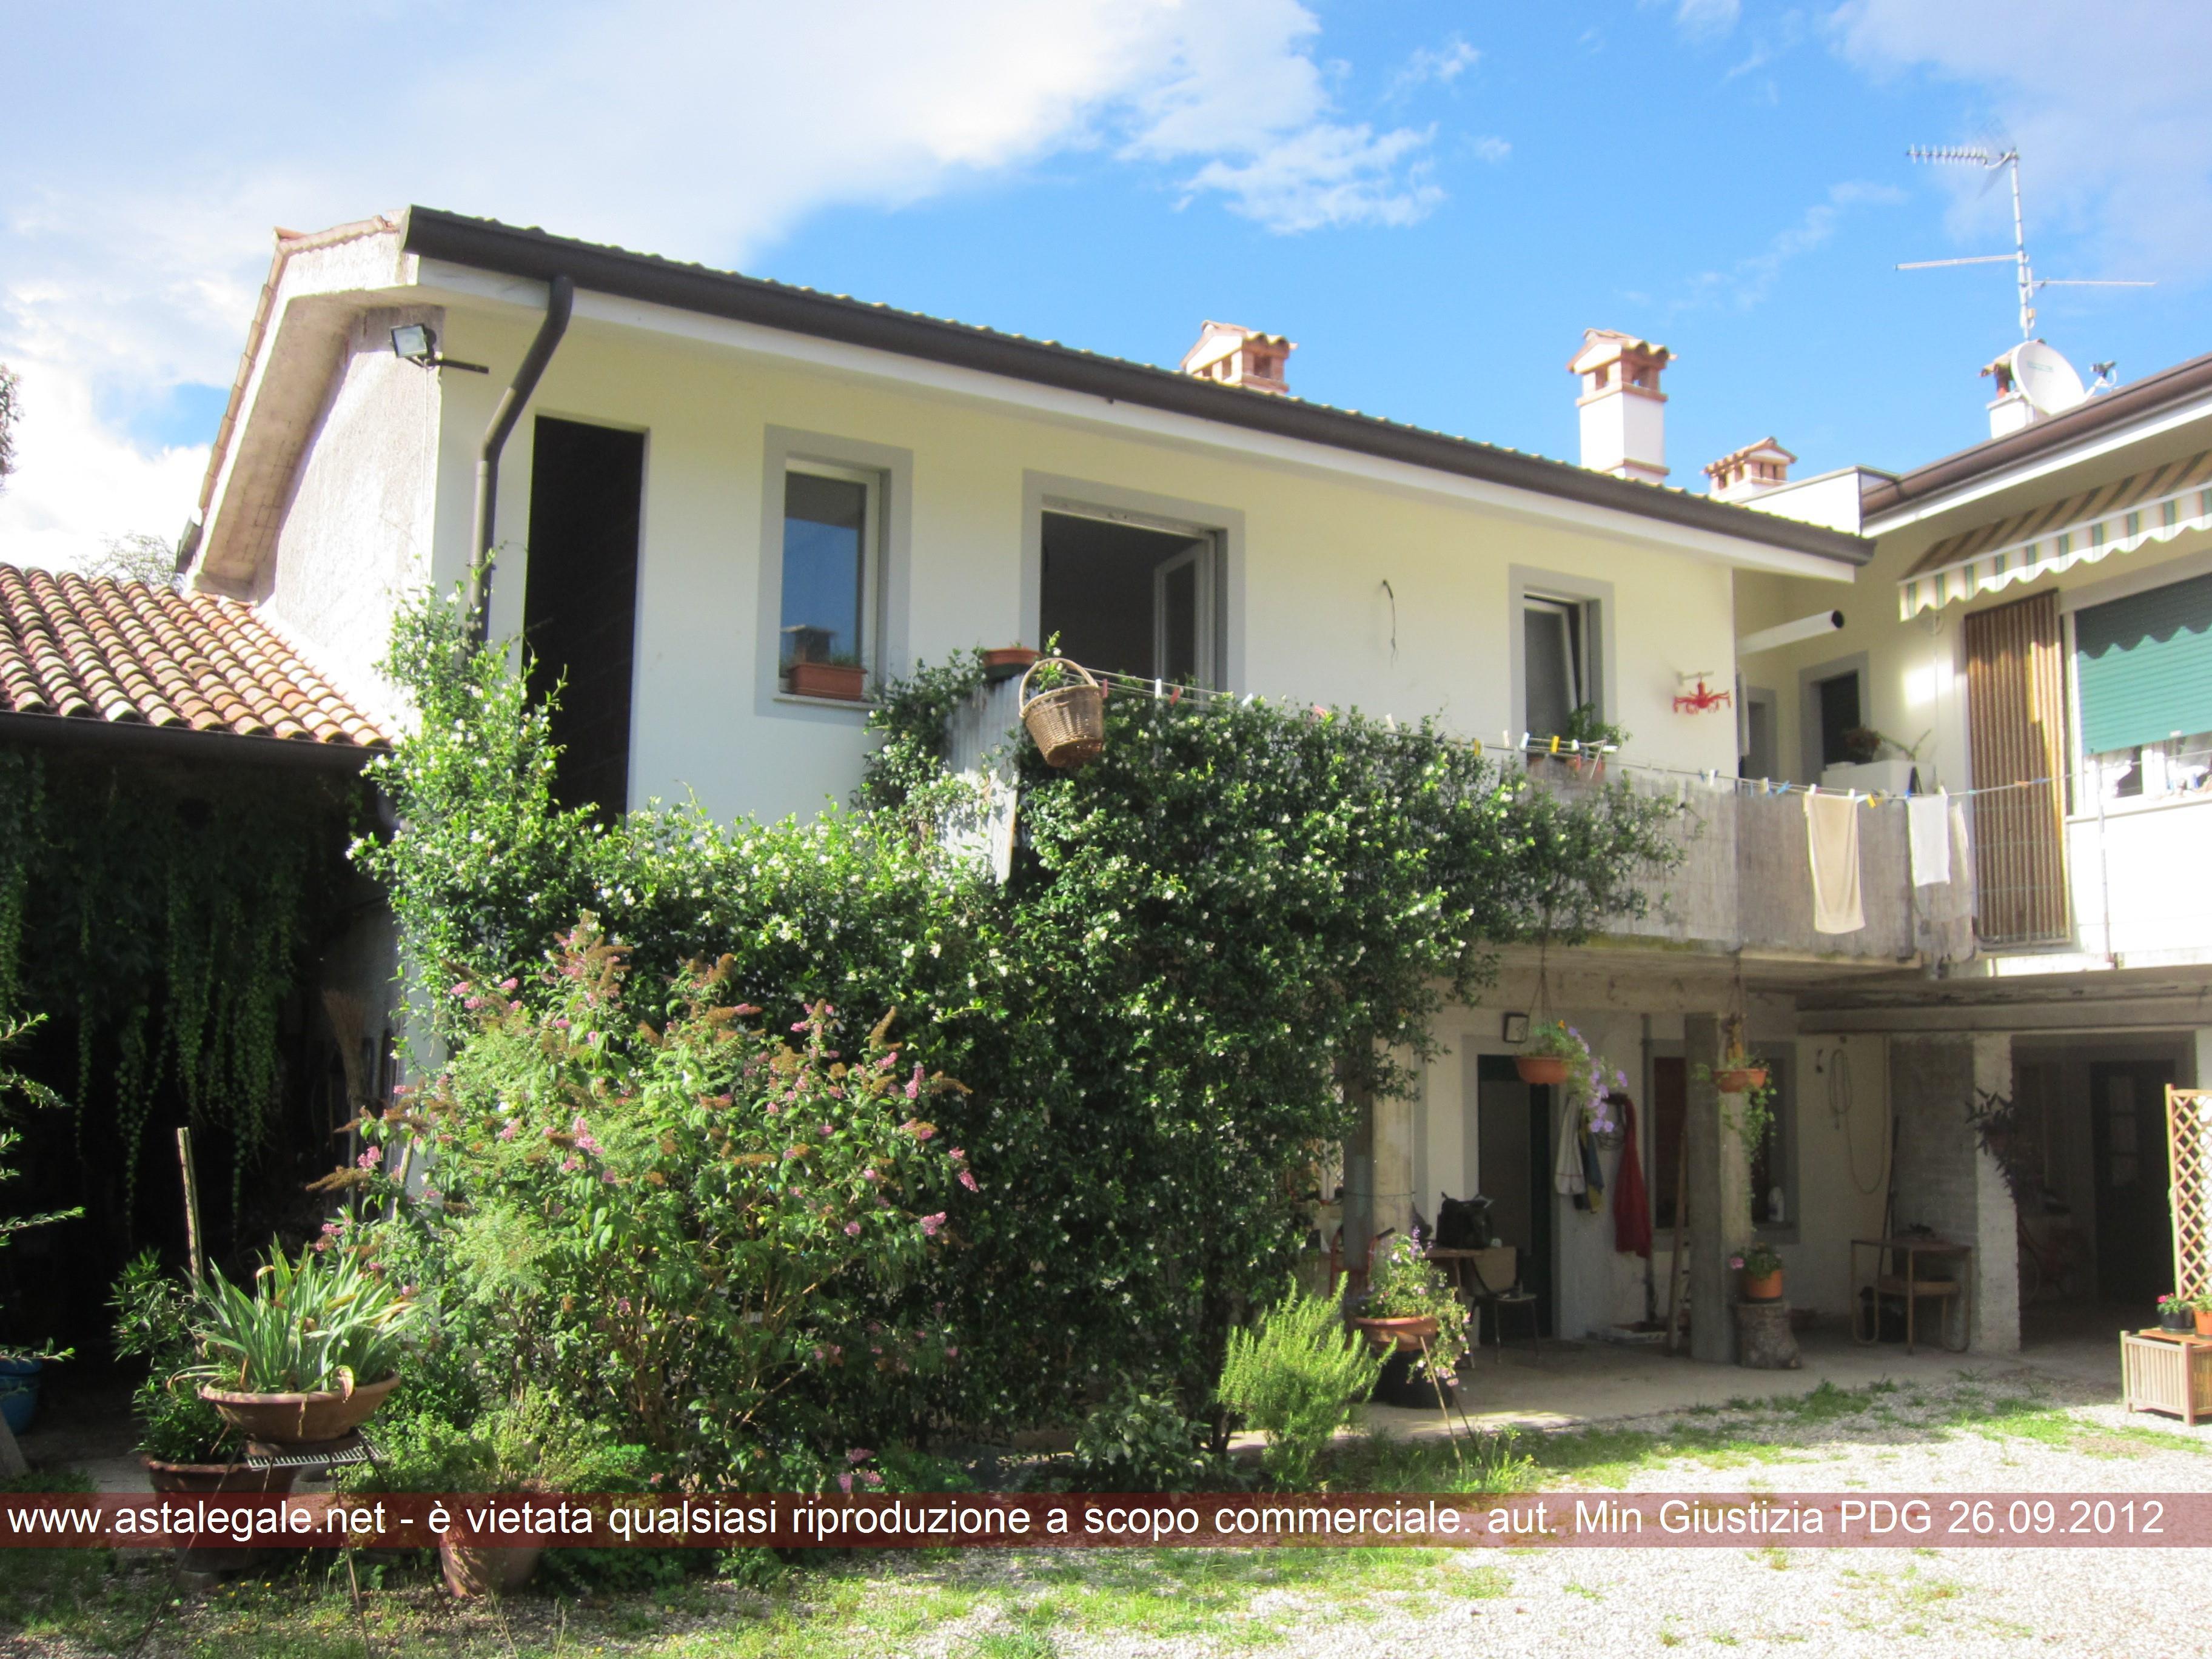 San Lorenzo Isontino (GO) Via GAVINANA 32